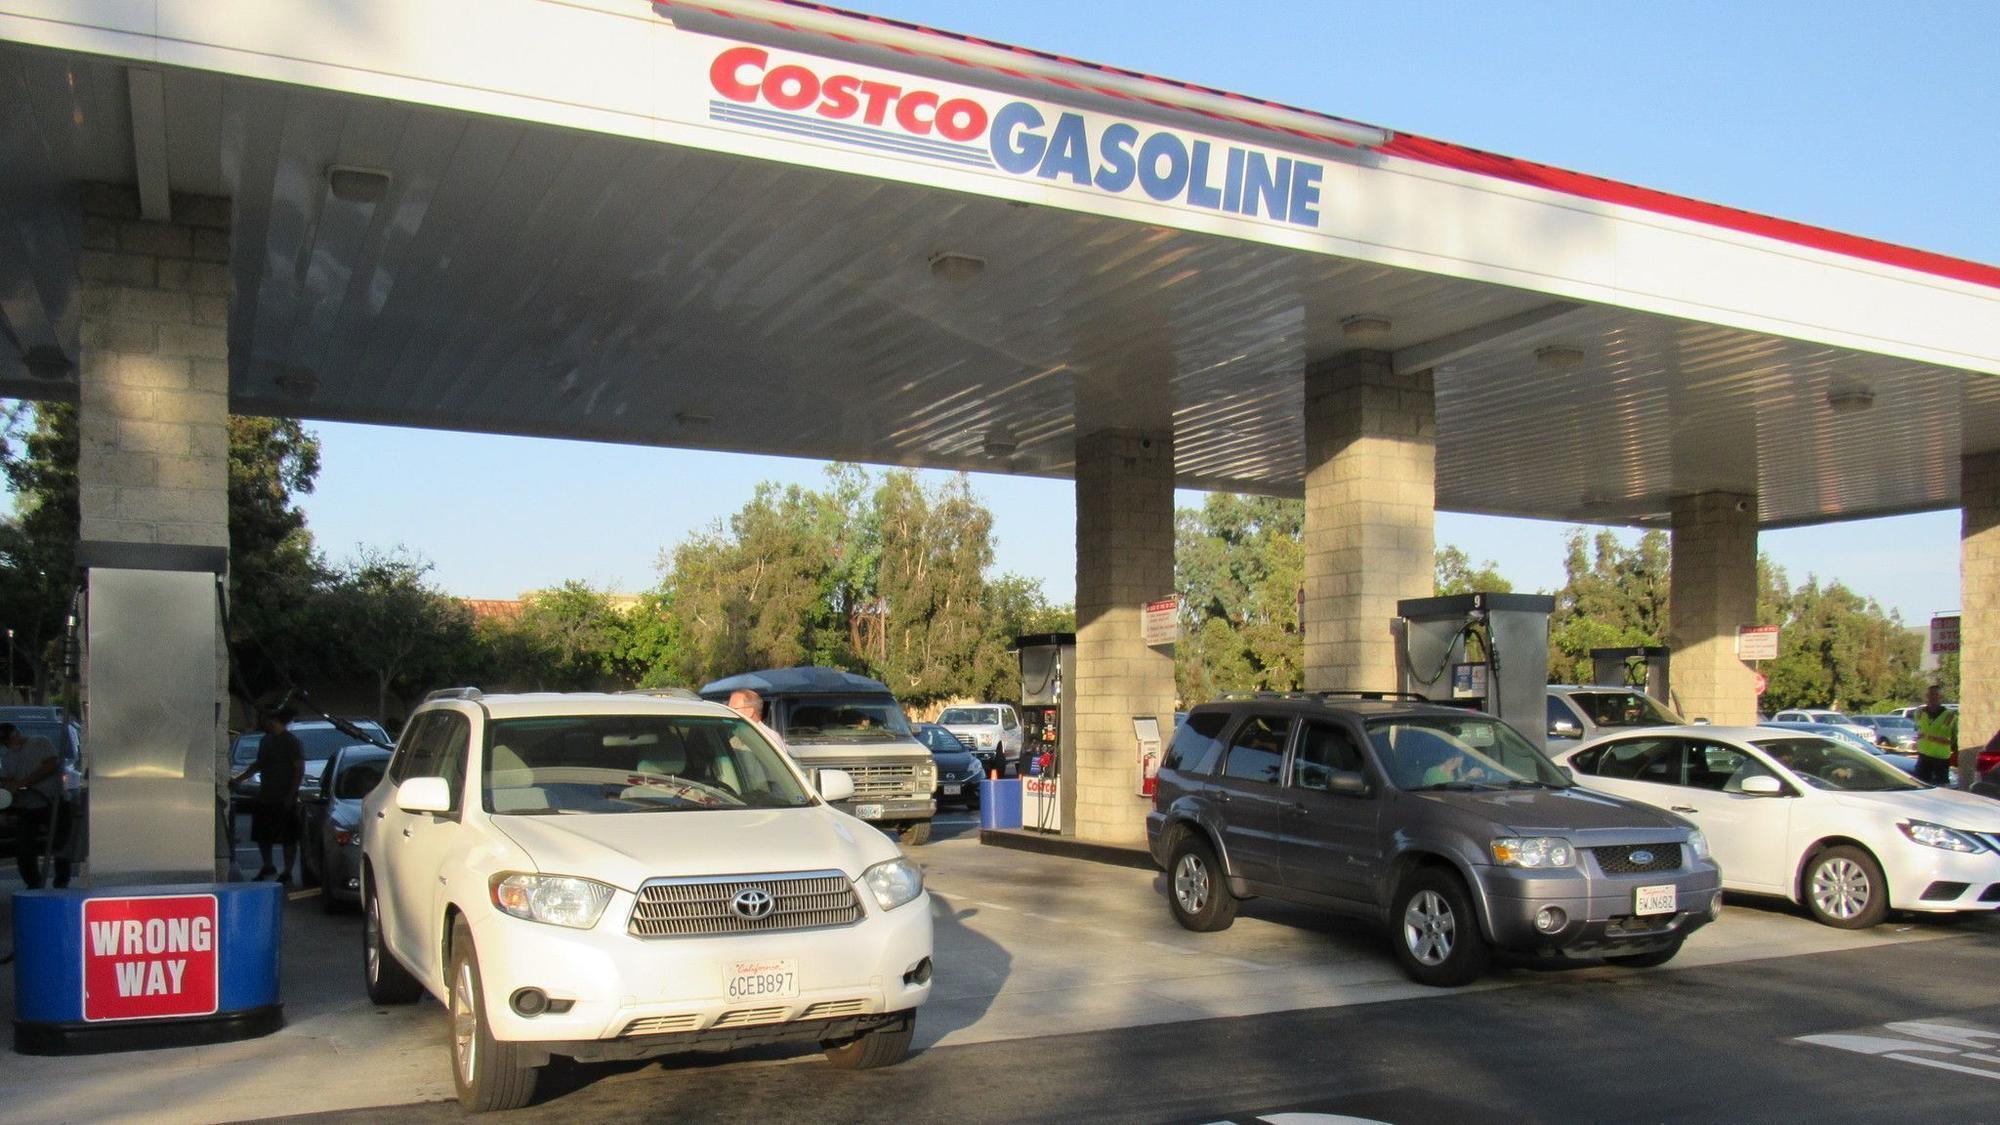 santee costco moving fuel station  adding more pumps